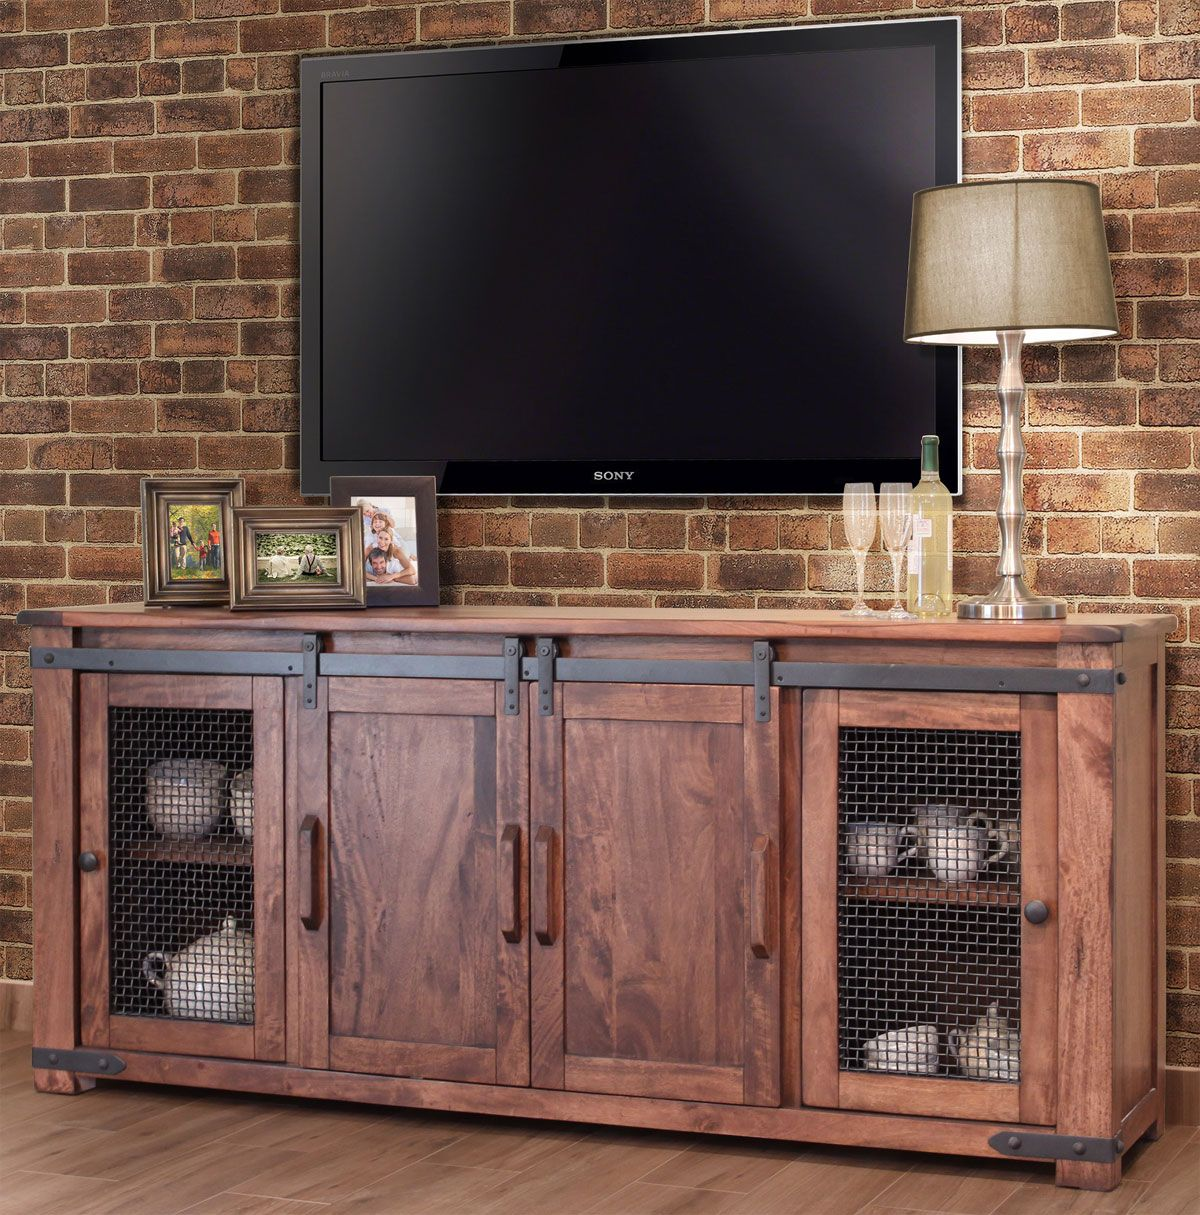 Parota Rustic 80 Tv Stand W Cabinet Doors Rustic Tv Stand Rustic Tv Console Tv Cabinets With Doors